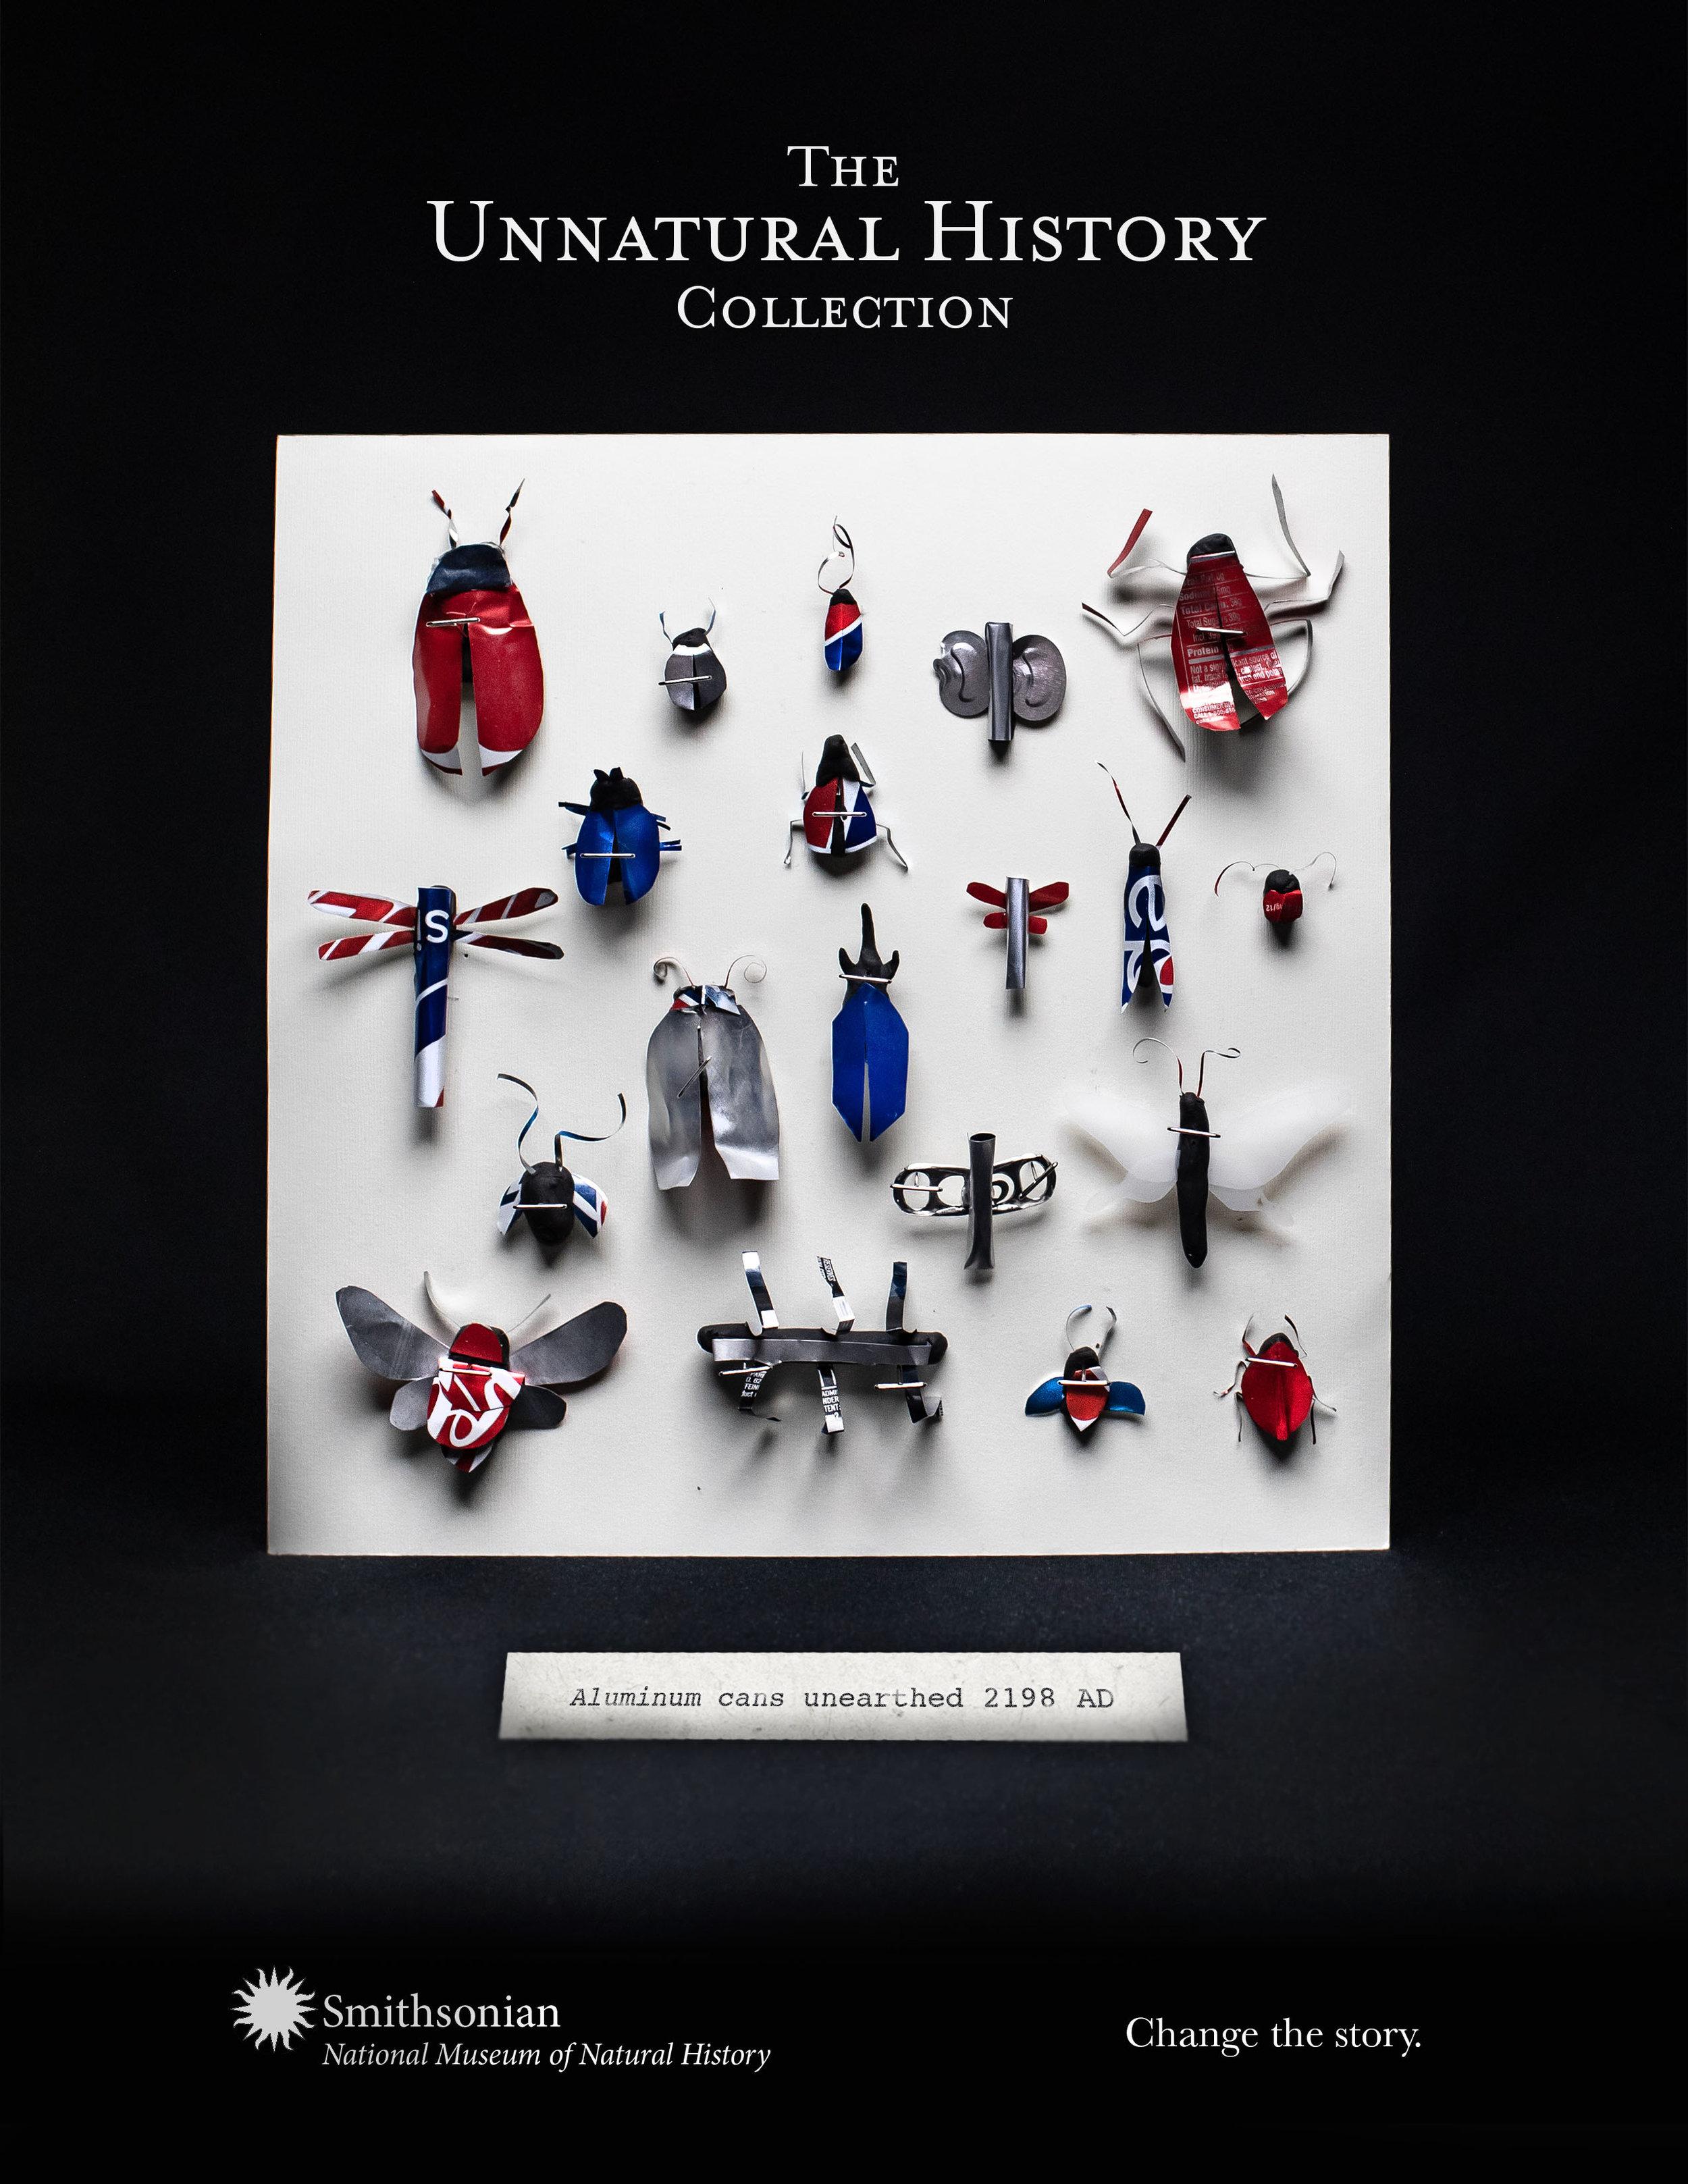 Mahaffey_Sumner_Smithsonian_bugs.jpg